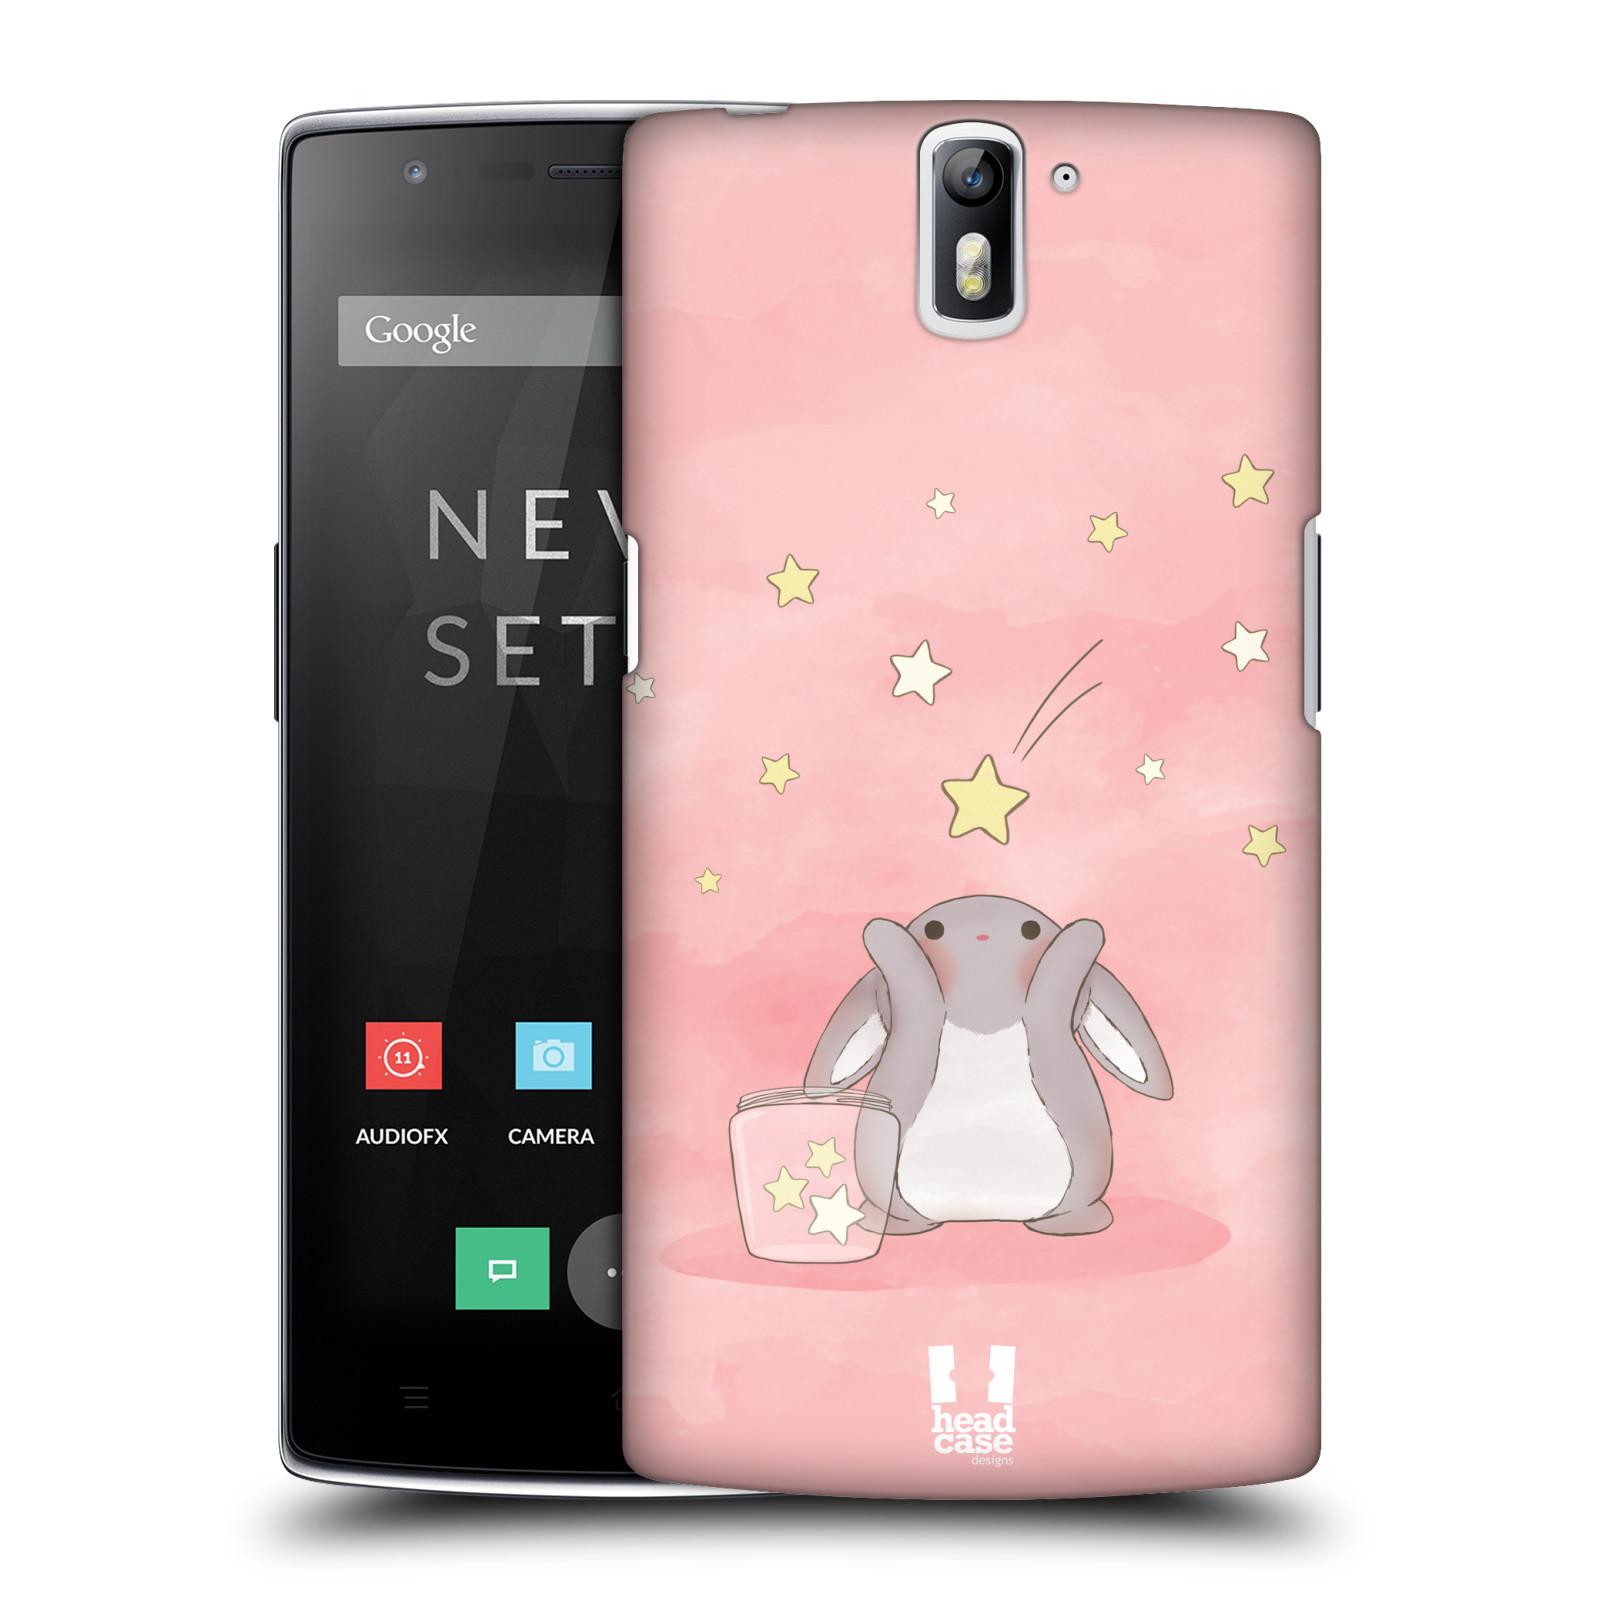 HEAD CASE pevný plastový obal na mobil OnePlus ONE vzor králíček a hvězdy růžová